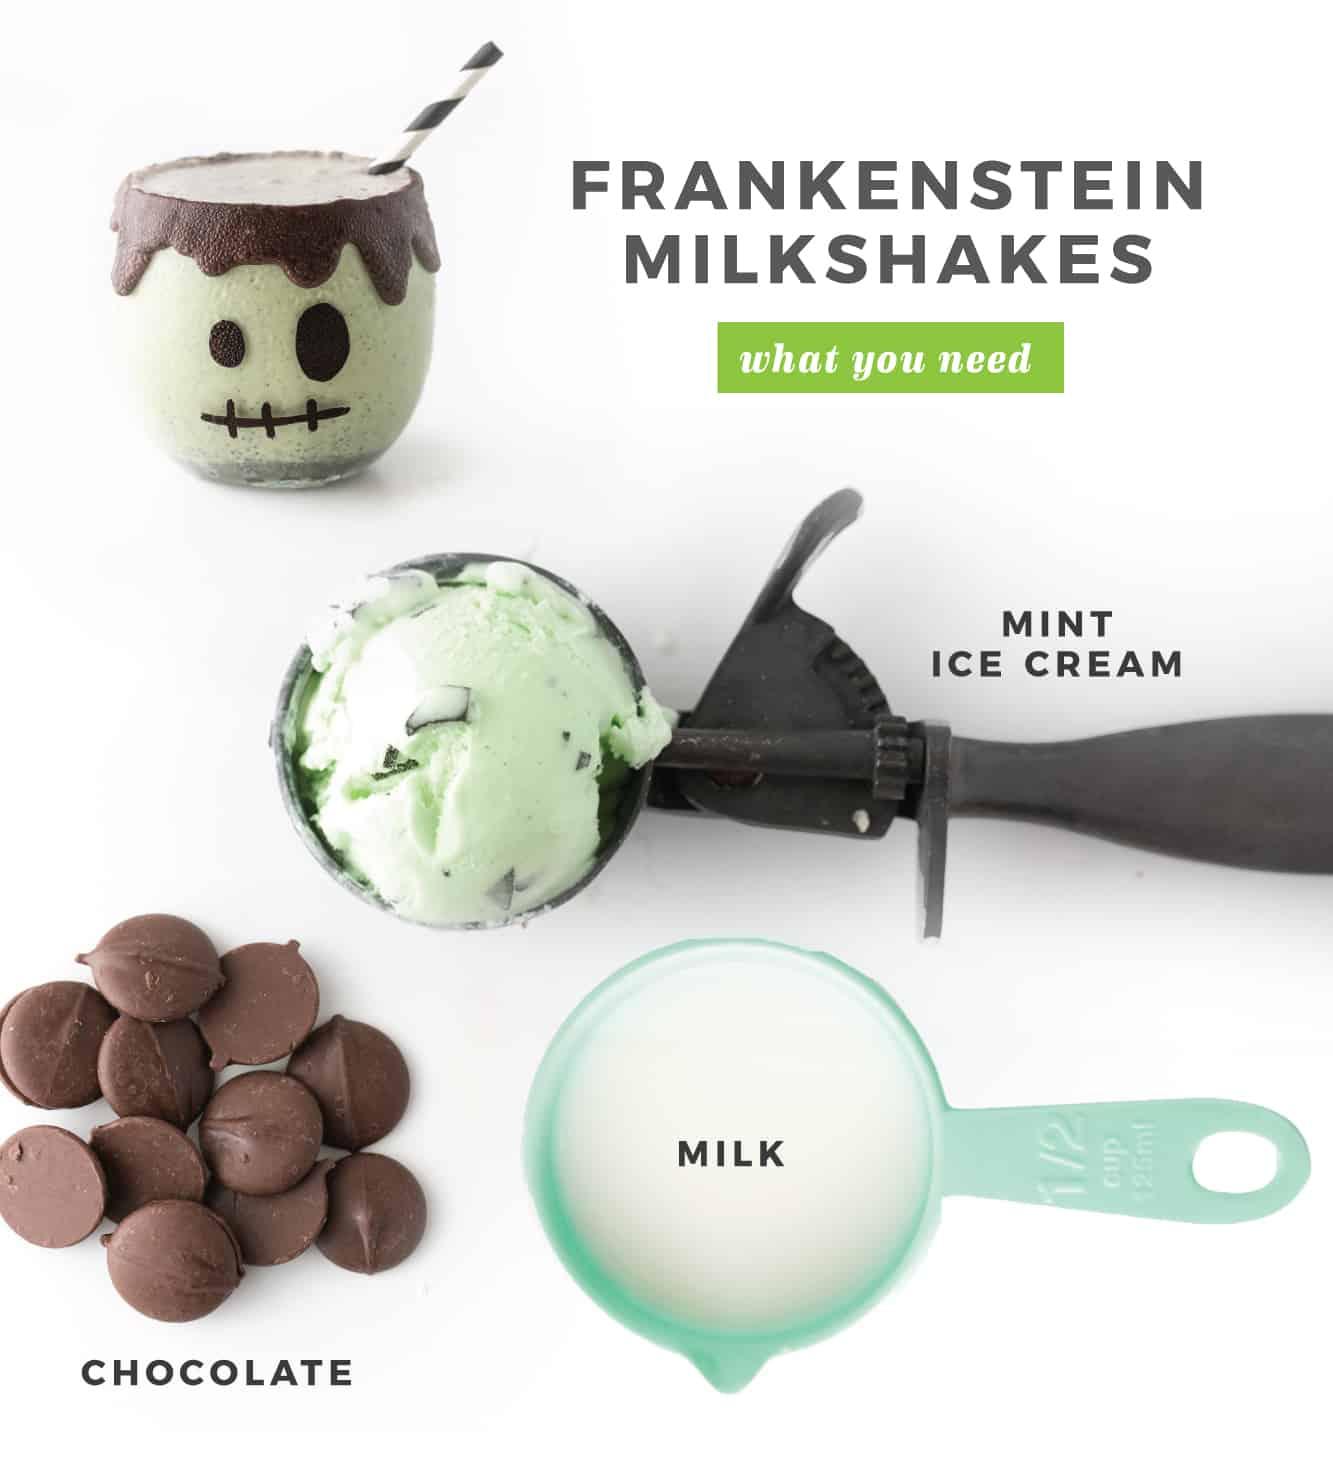 Ingredients to make Frankenstein Halloween Milkshakes. Mint chip ice cream scoop, dark chocolate wafers, blue measuring cup of milk, frankenstein milkshake.